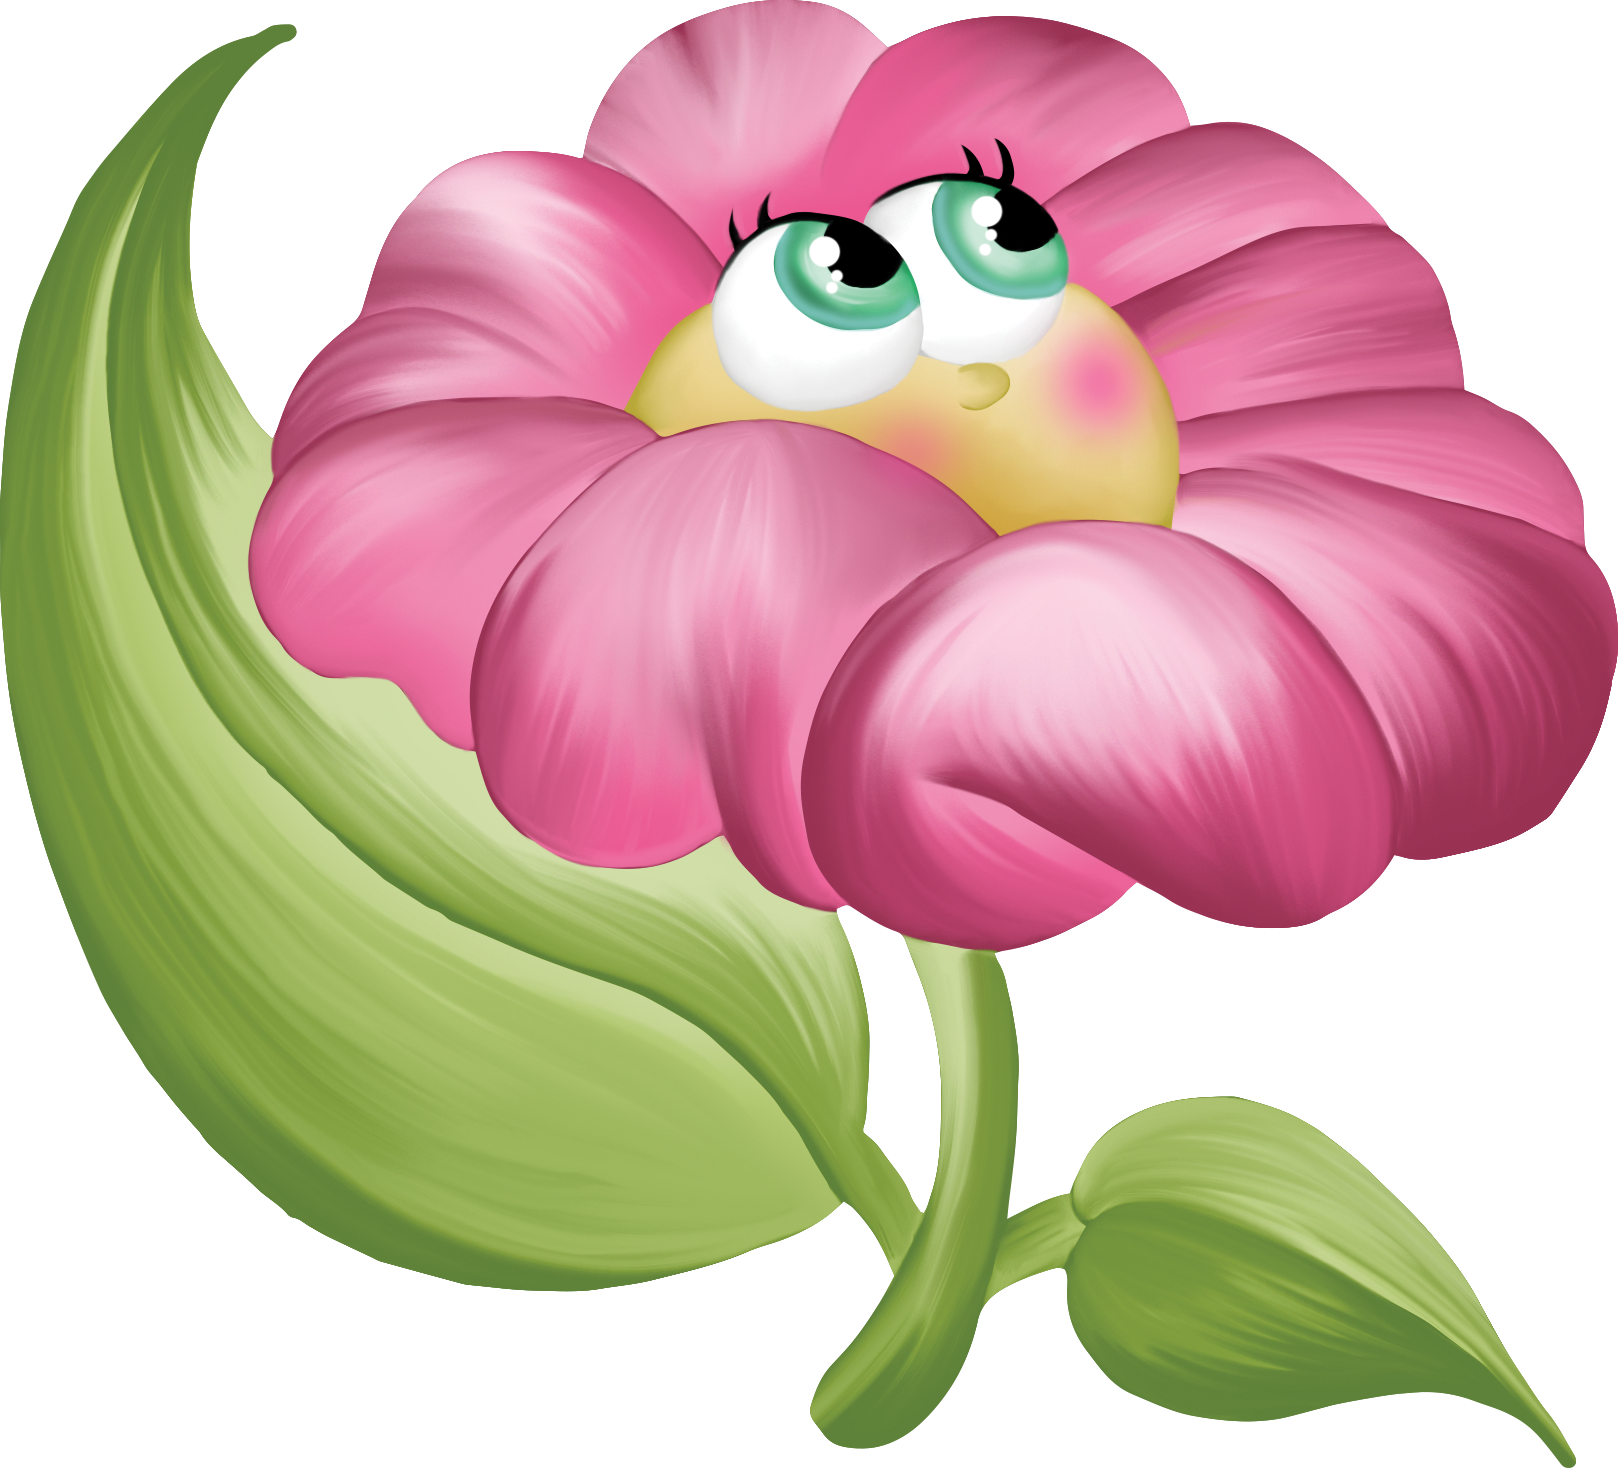 Цветок рисунок картинка